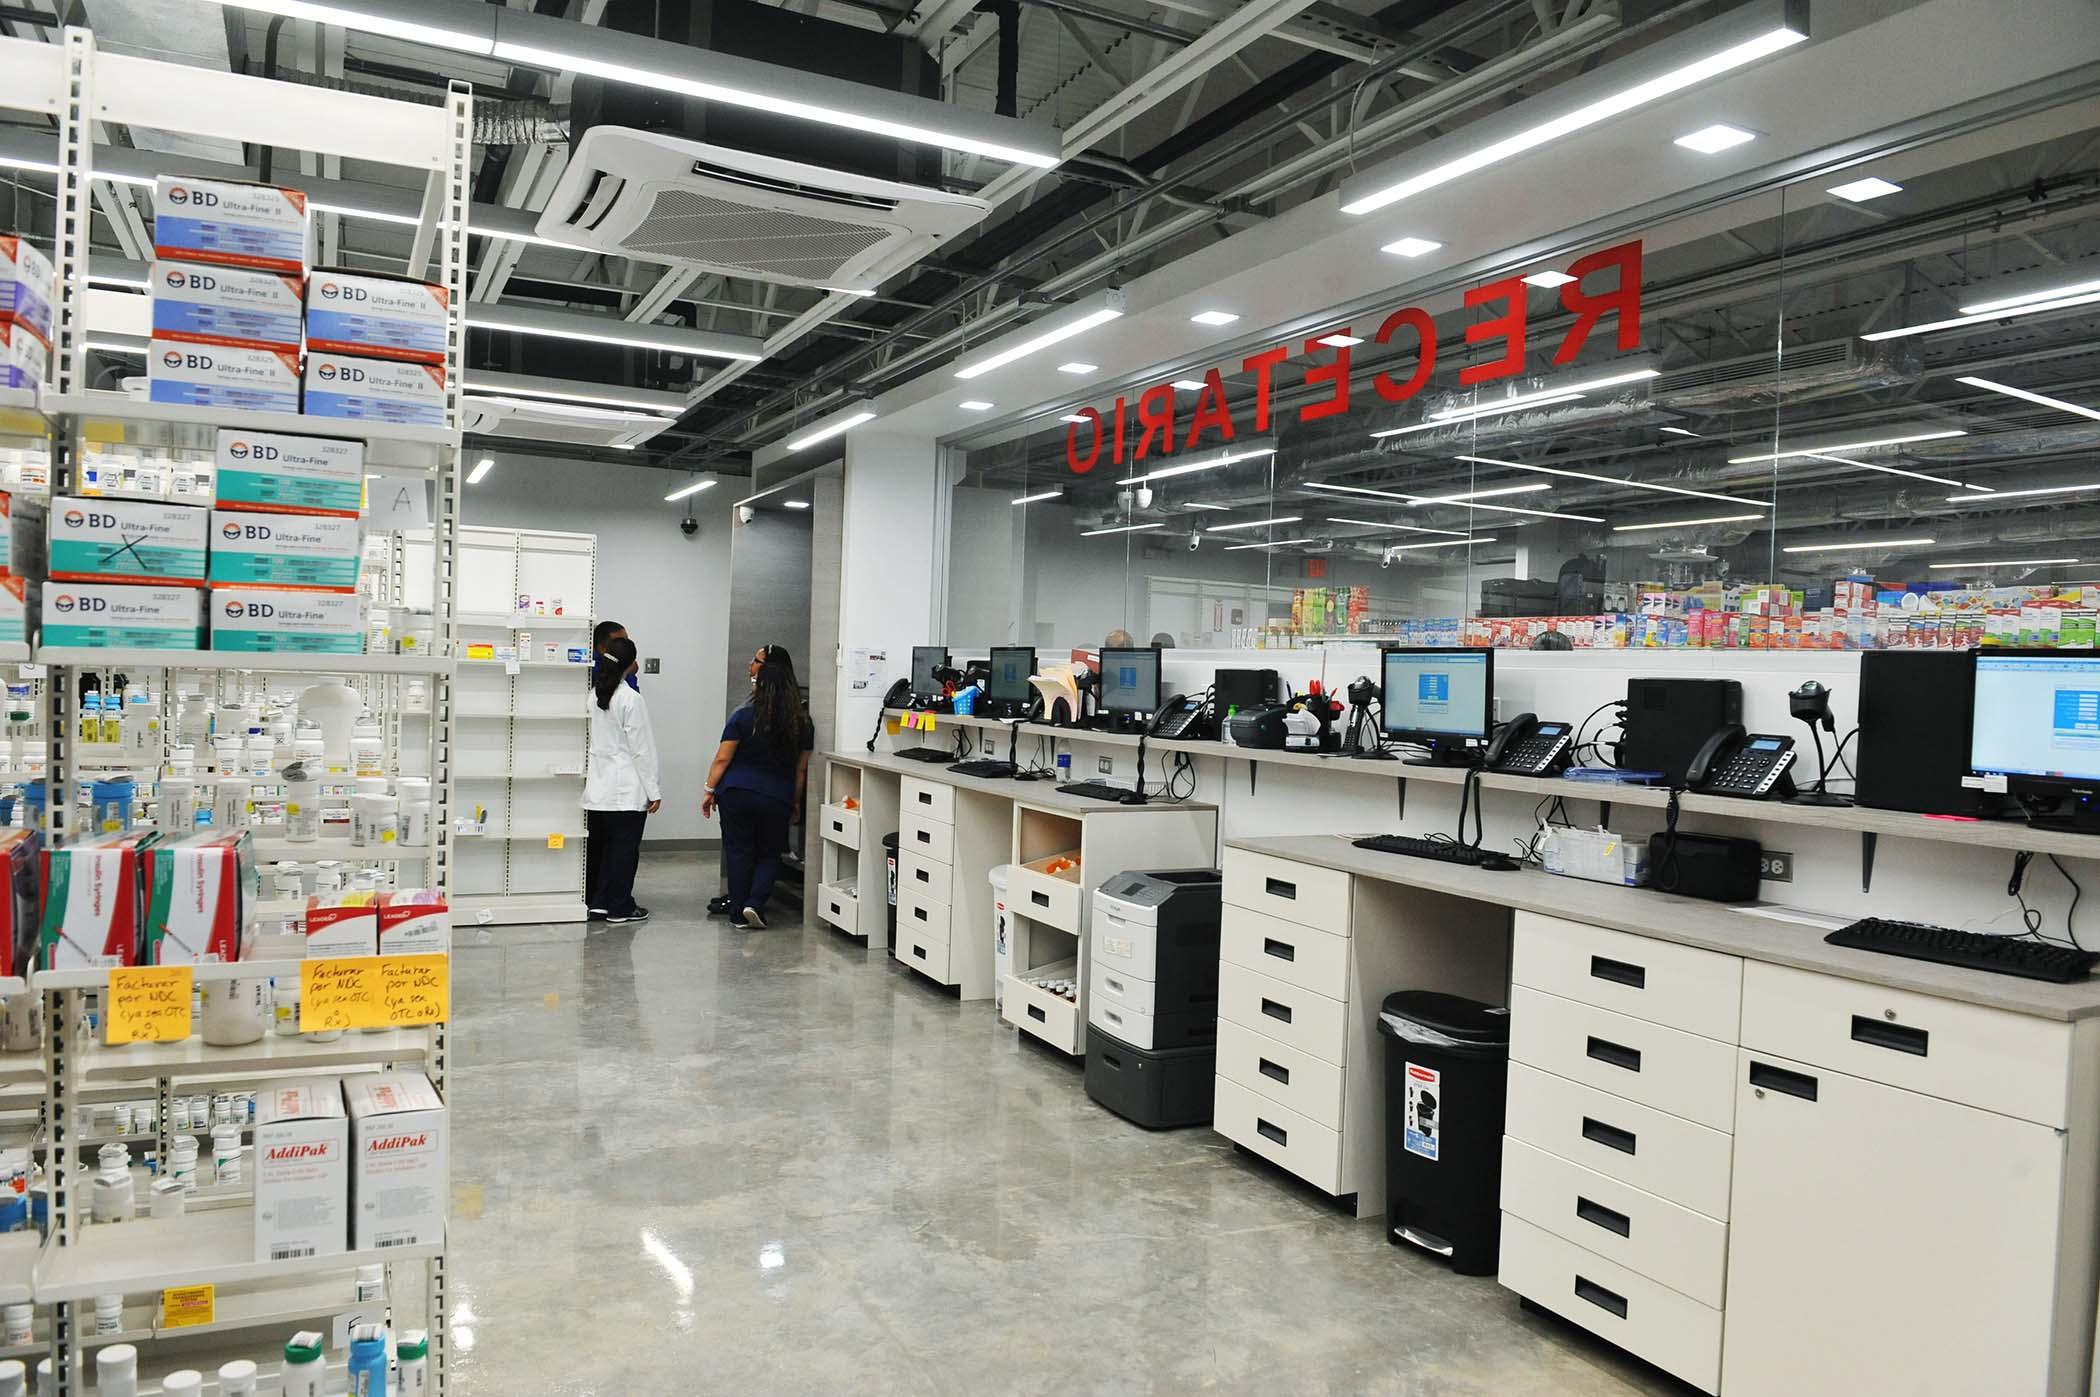 Inauguracion_Farmacias_Plaza-Plaza_del_Sol-22.jpg